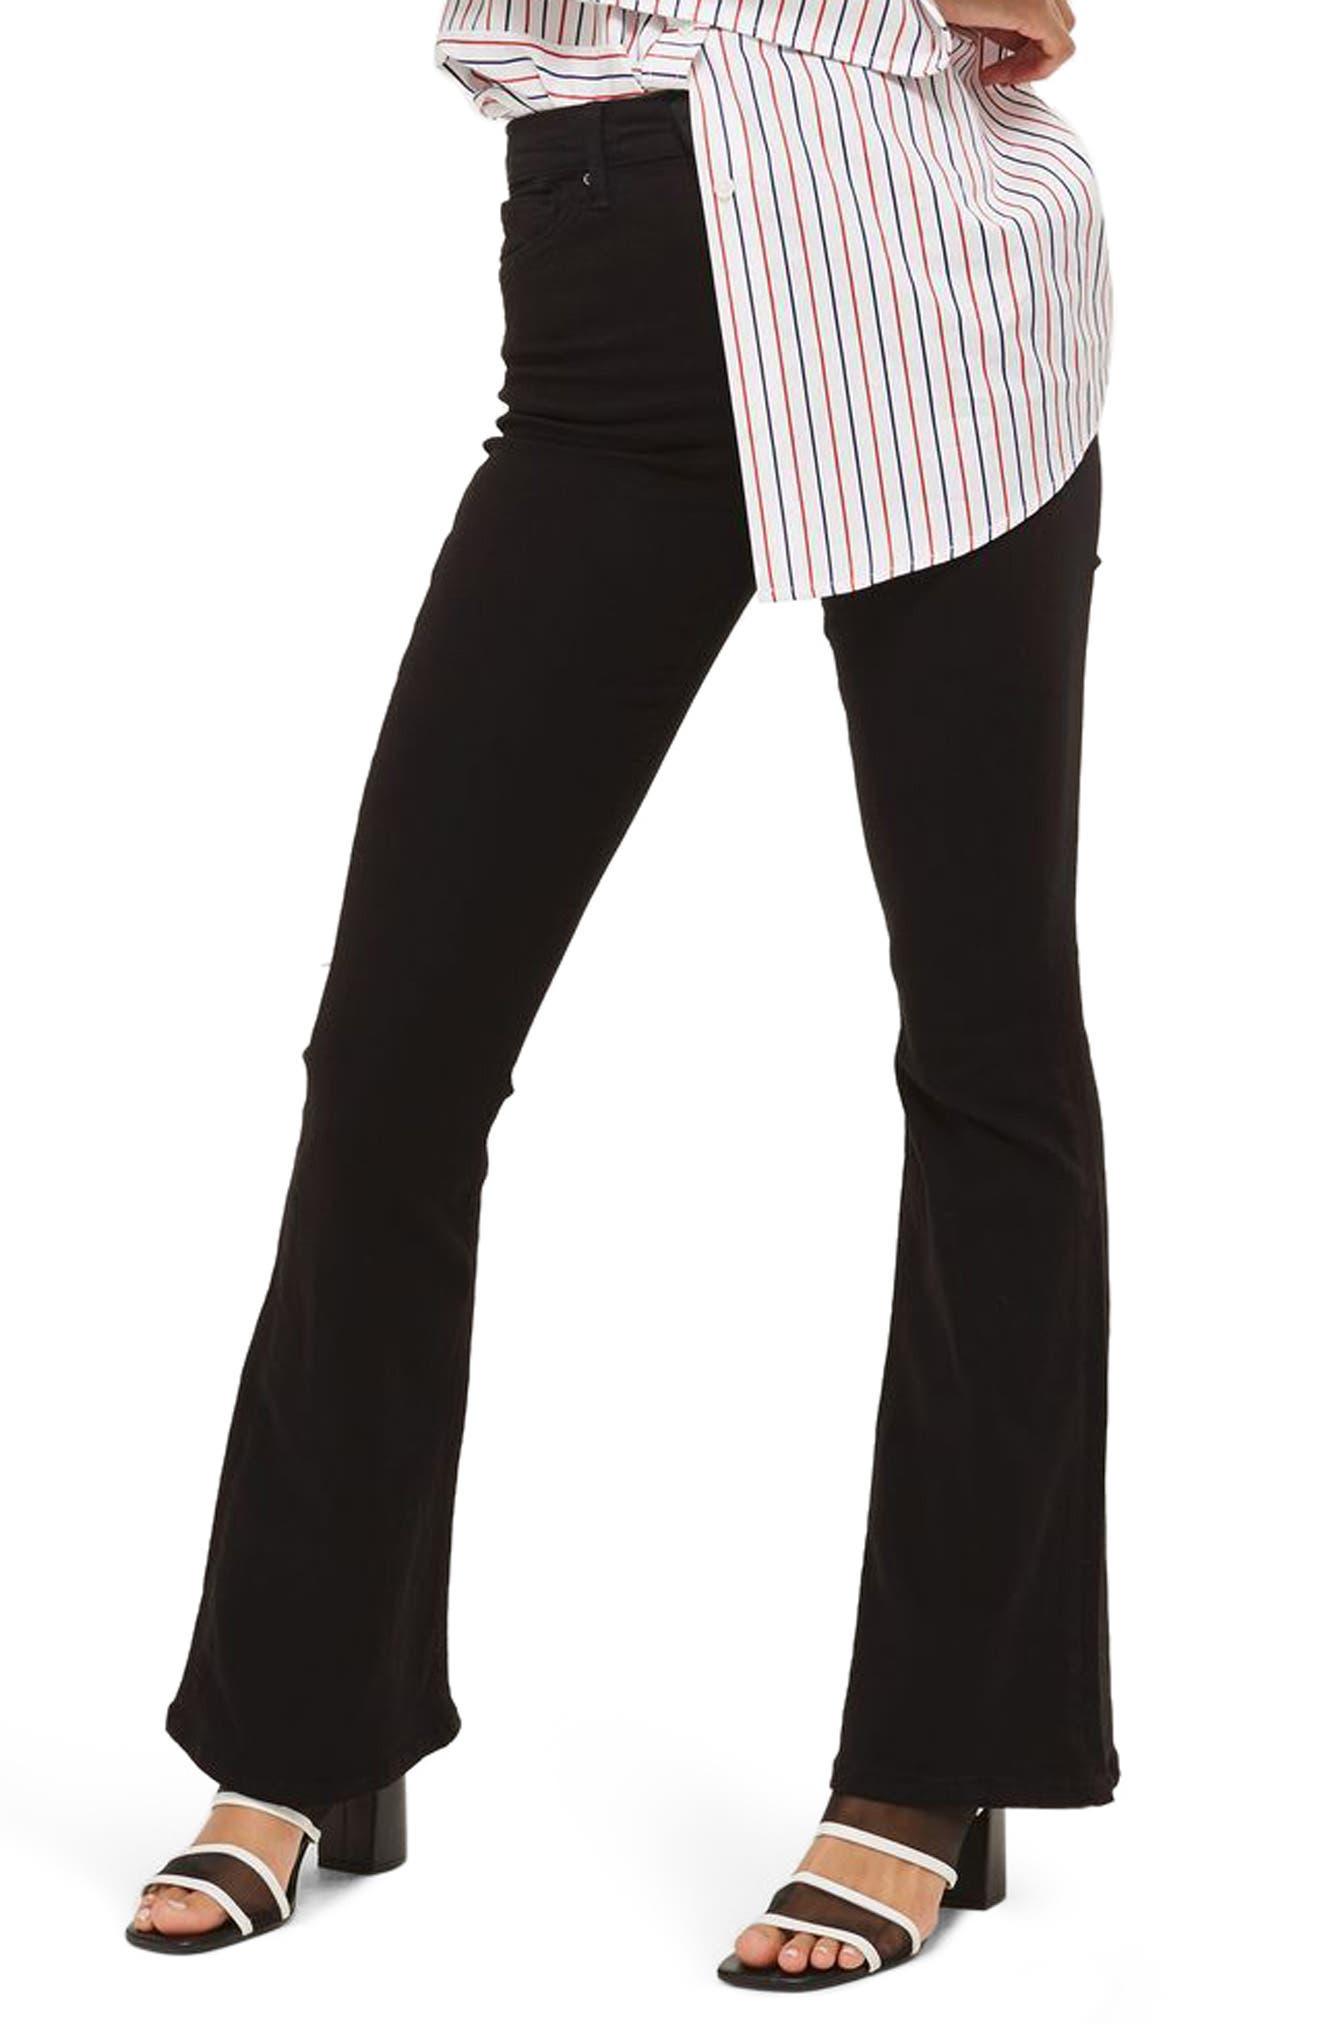 Topshop Jamie High Waist Flare Jeans